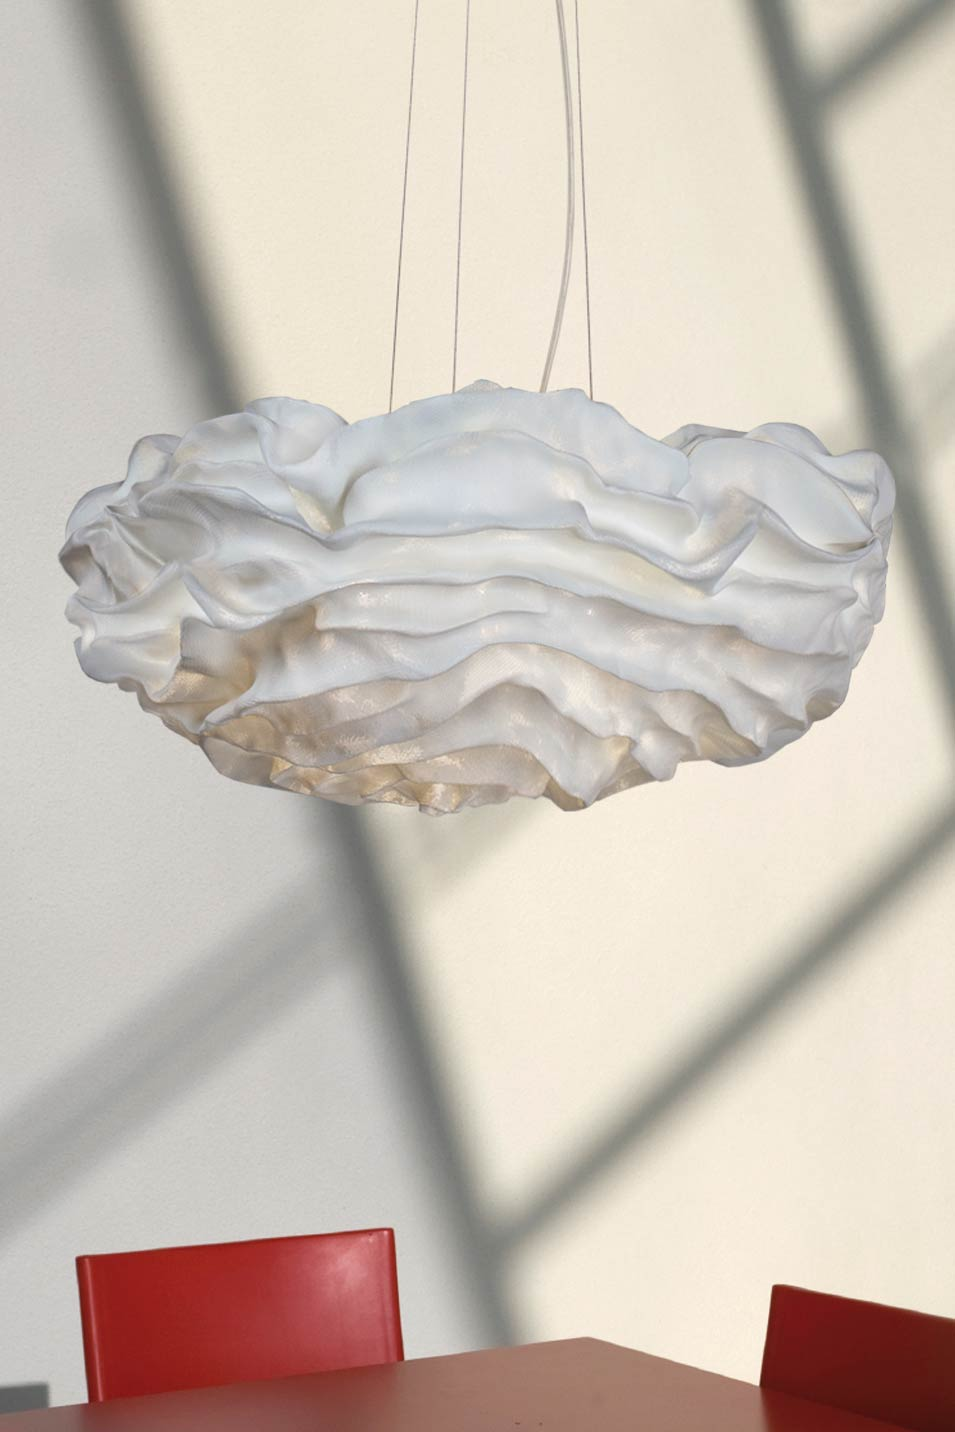 suspension fleur de tissu pliss blanc nevo arturo alvarez luminaire design fabriqu en. Black Bedroom Furniture Sets. Home Design Ideas